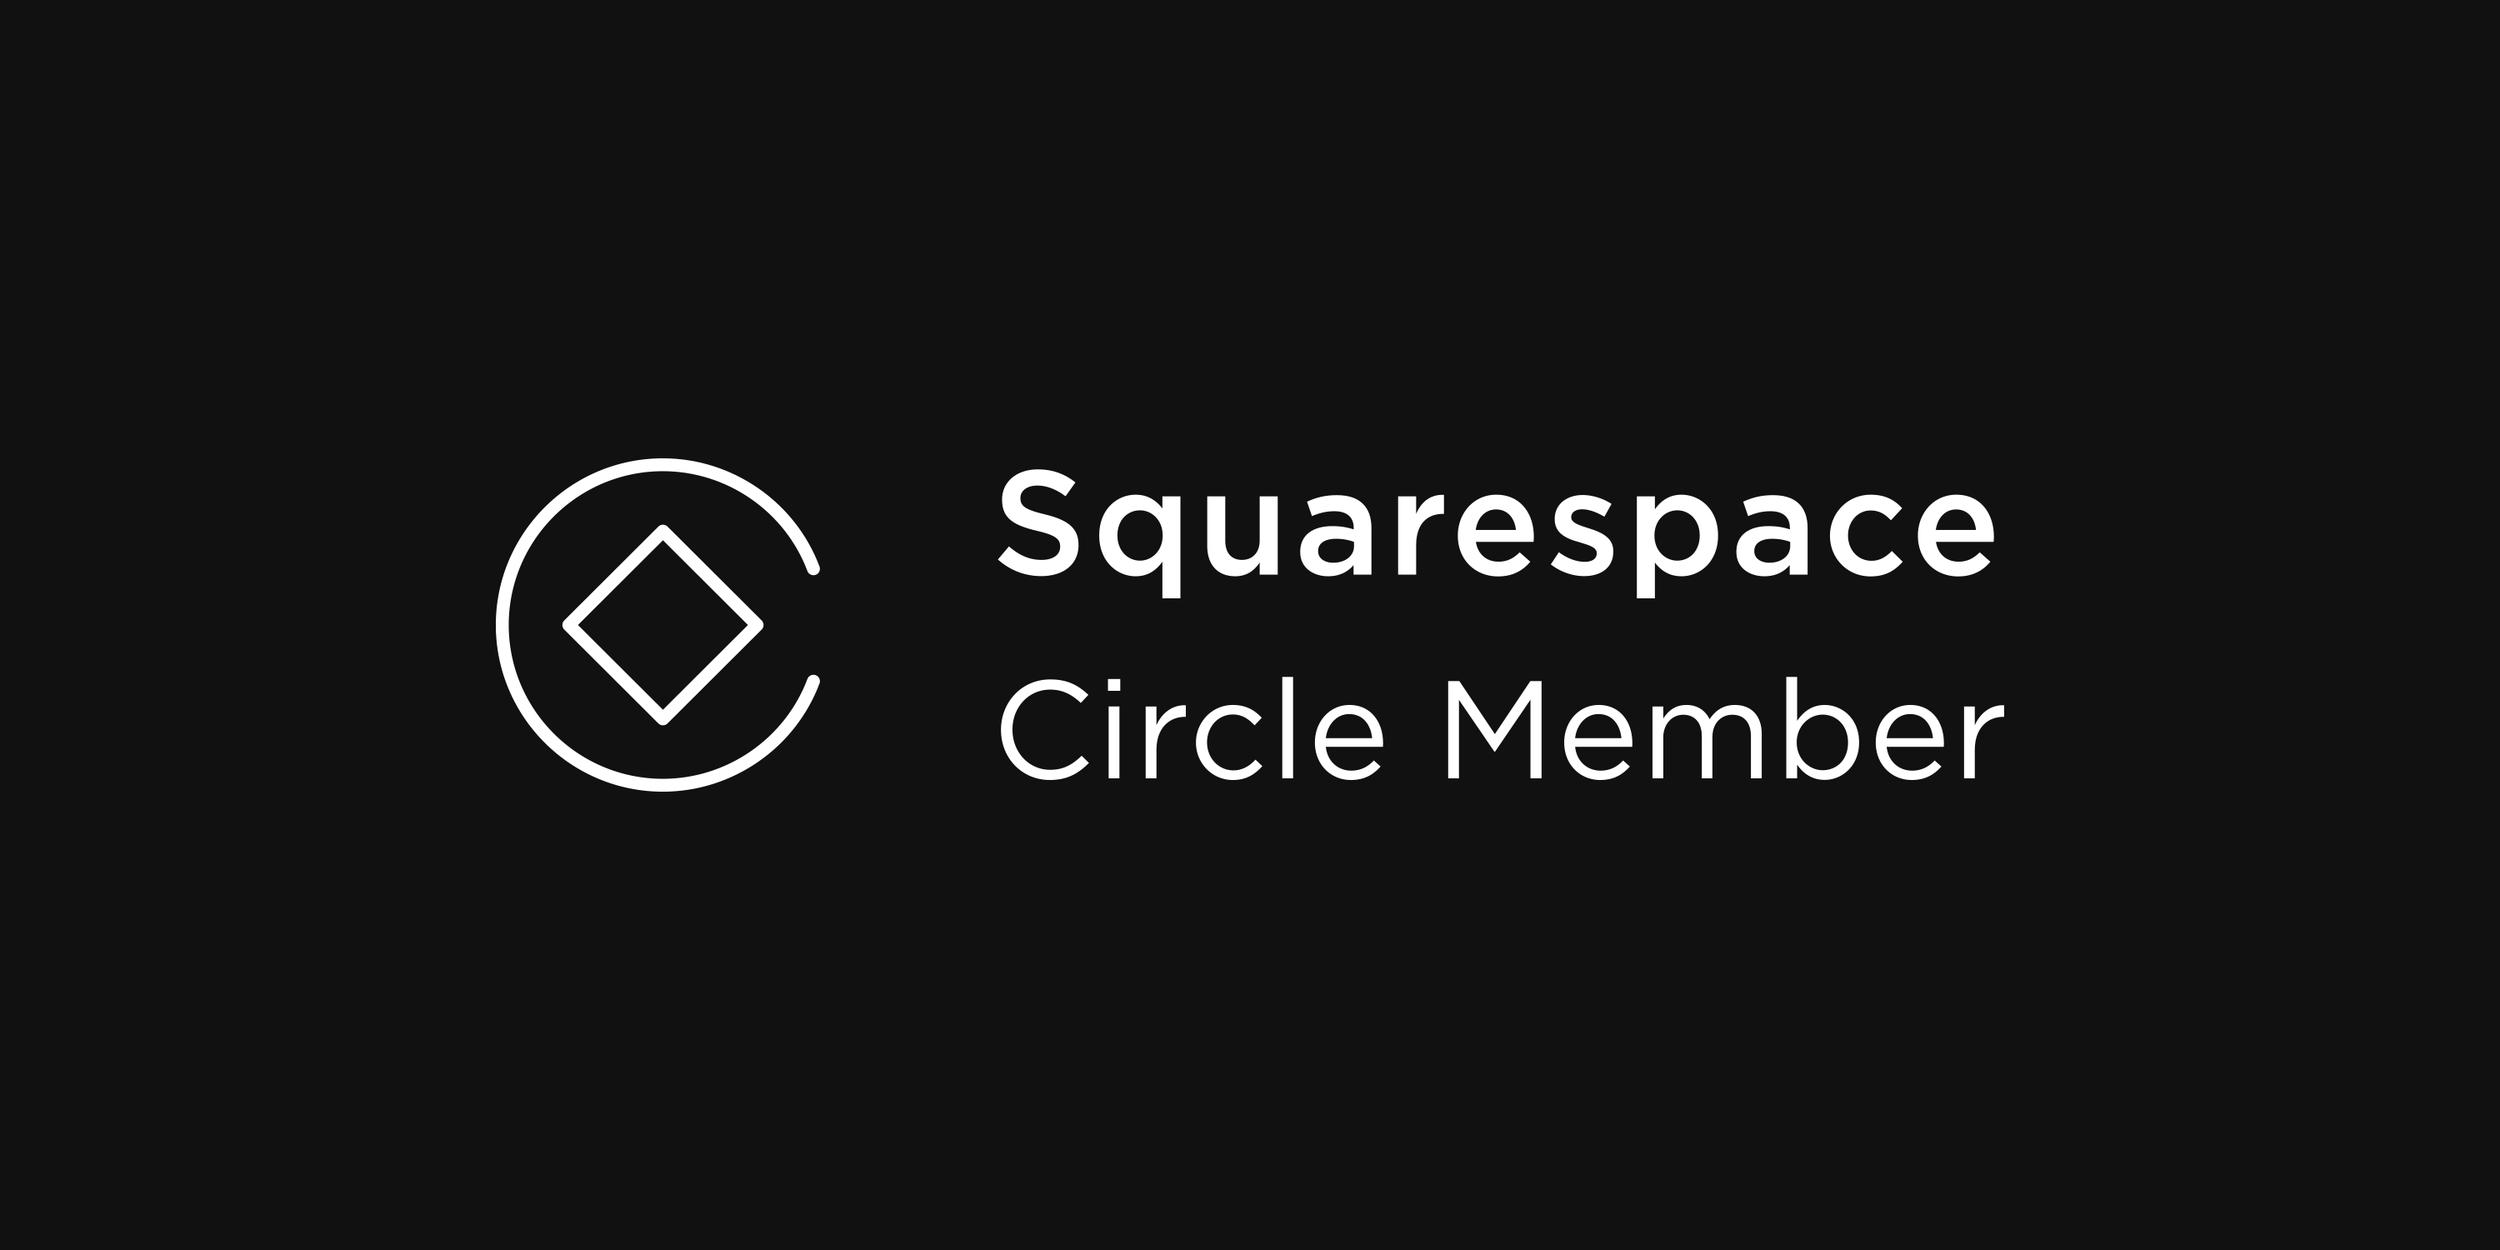 Squarespace Nottingham, Jack Neville Squarespace Expert